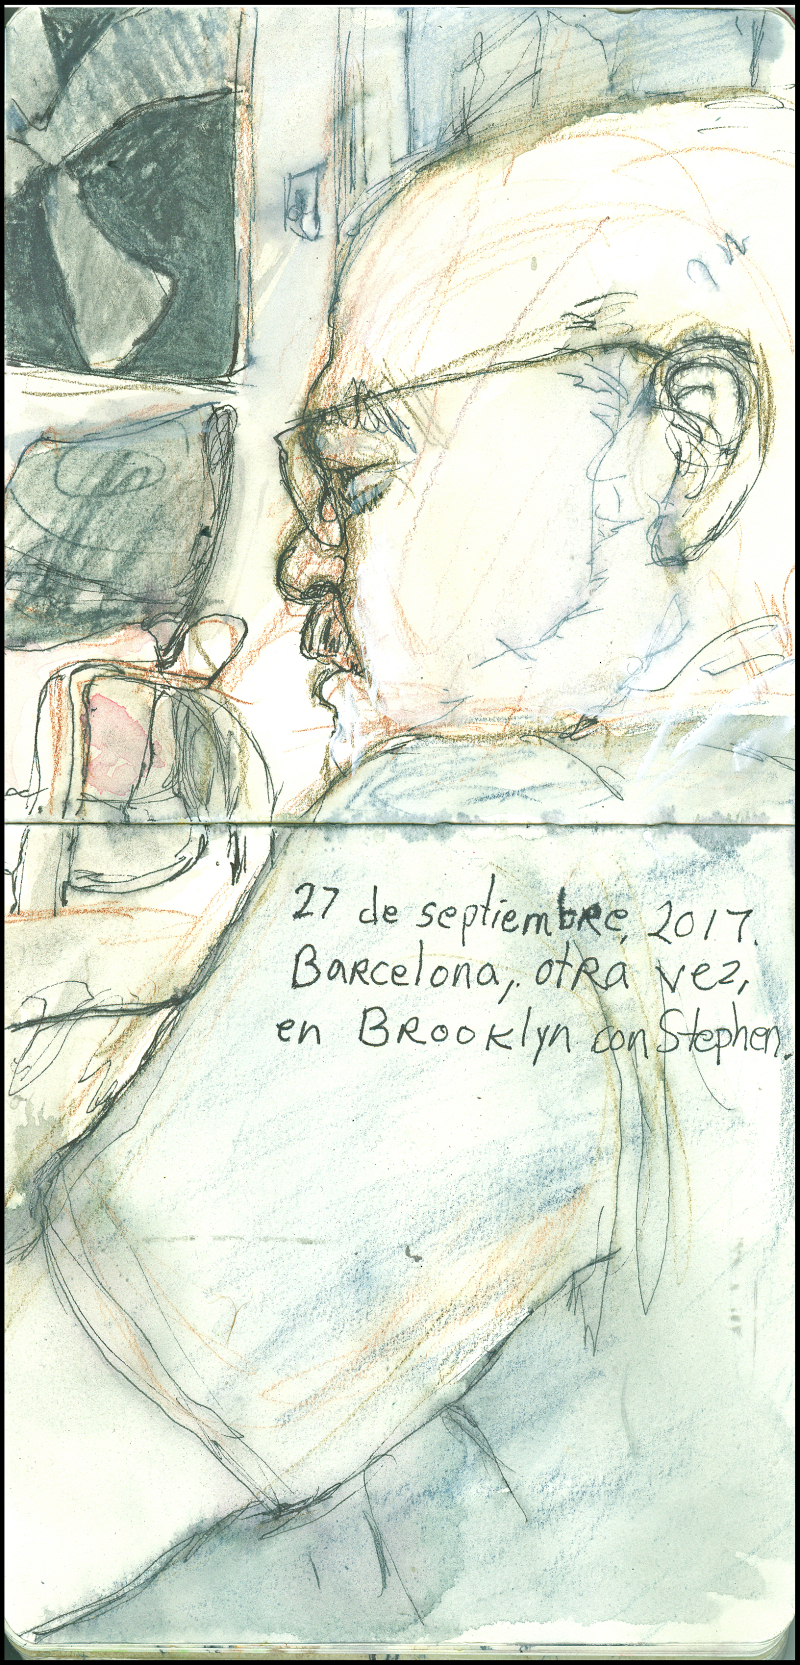 September27_2017_barcelona en brooklyn